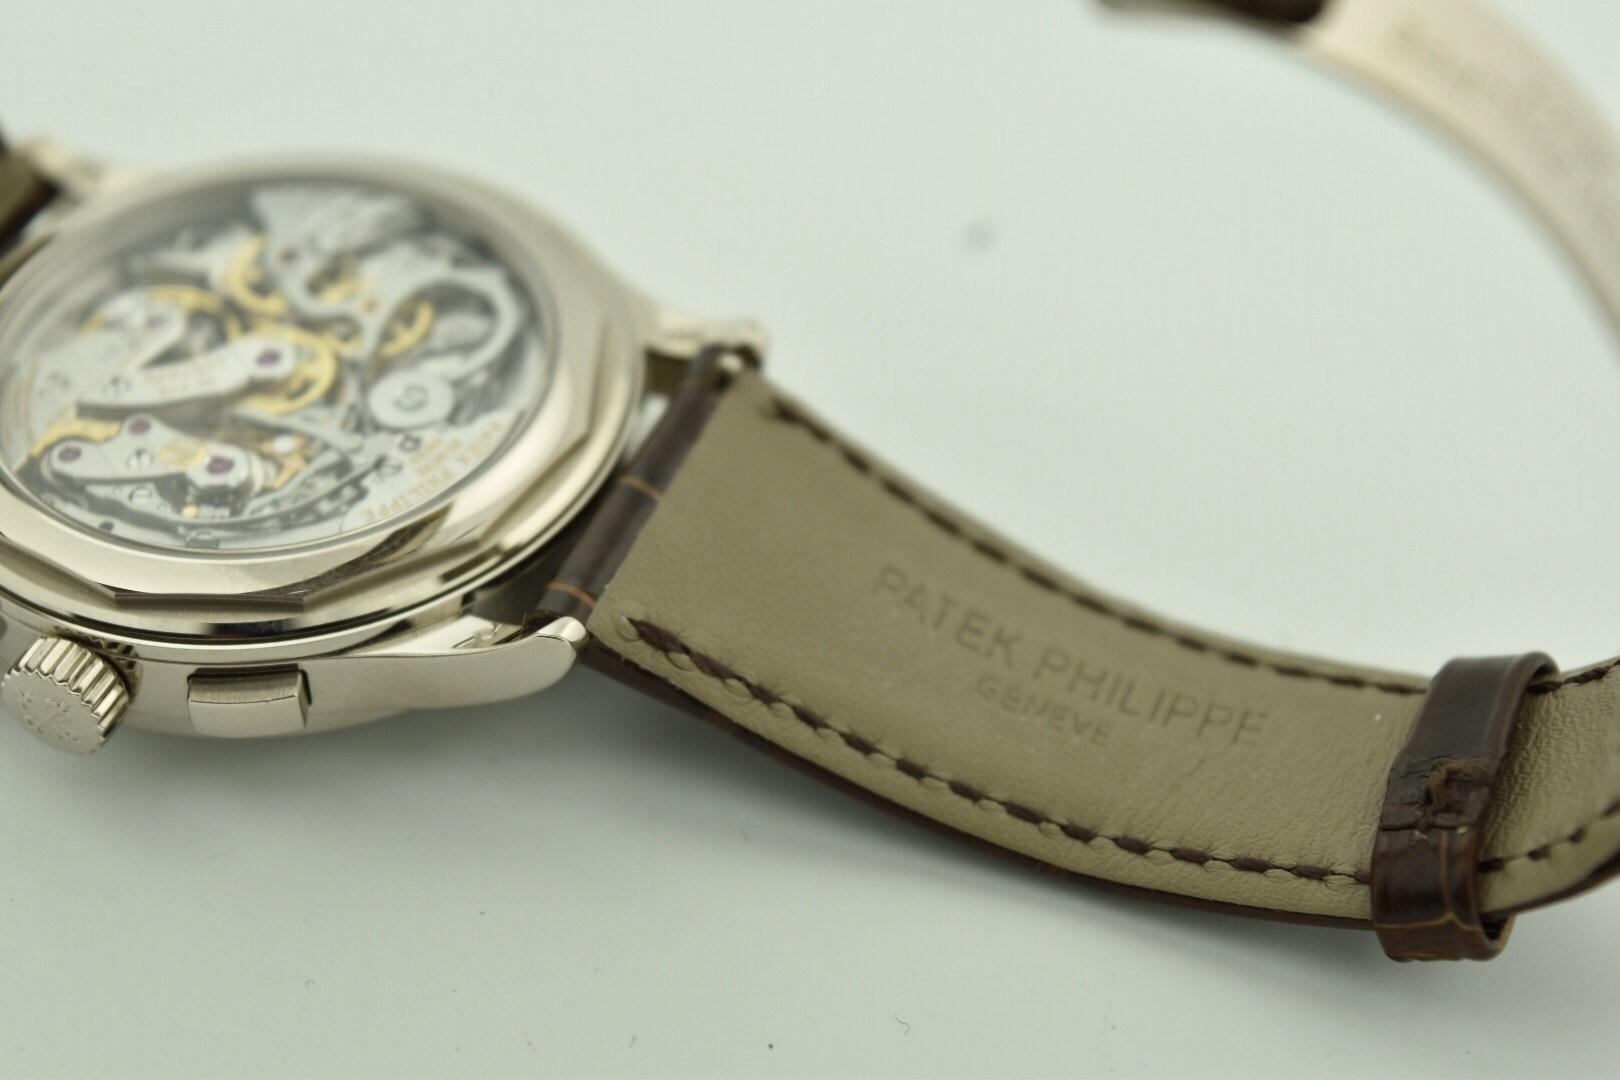 IMG 7575 - Patek Philippe Chronograph